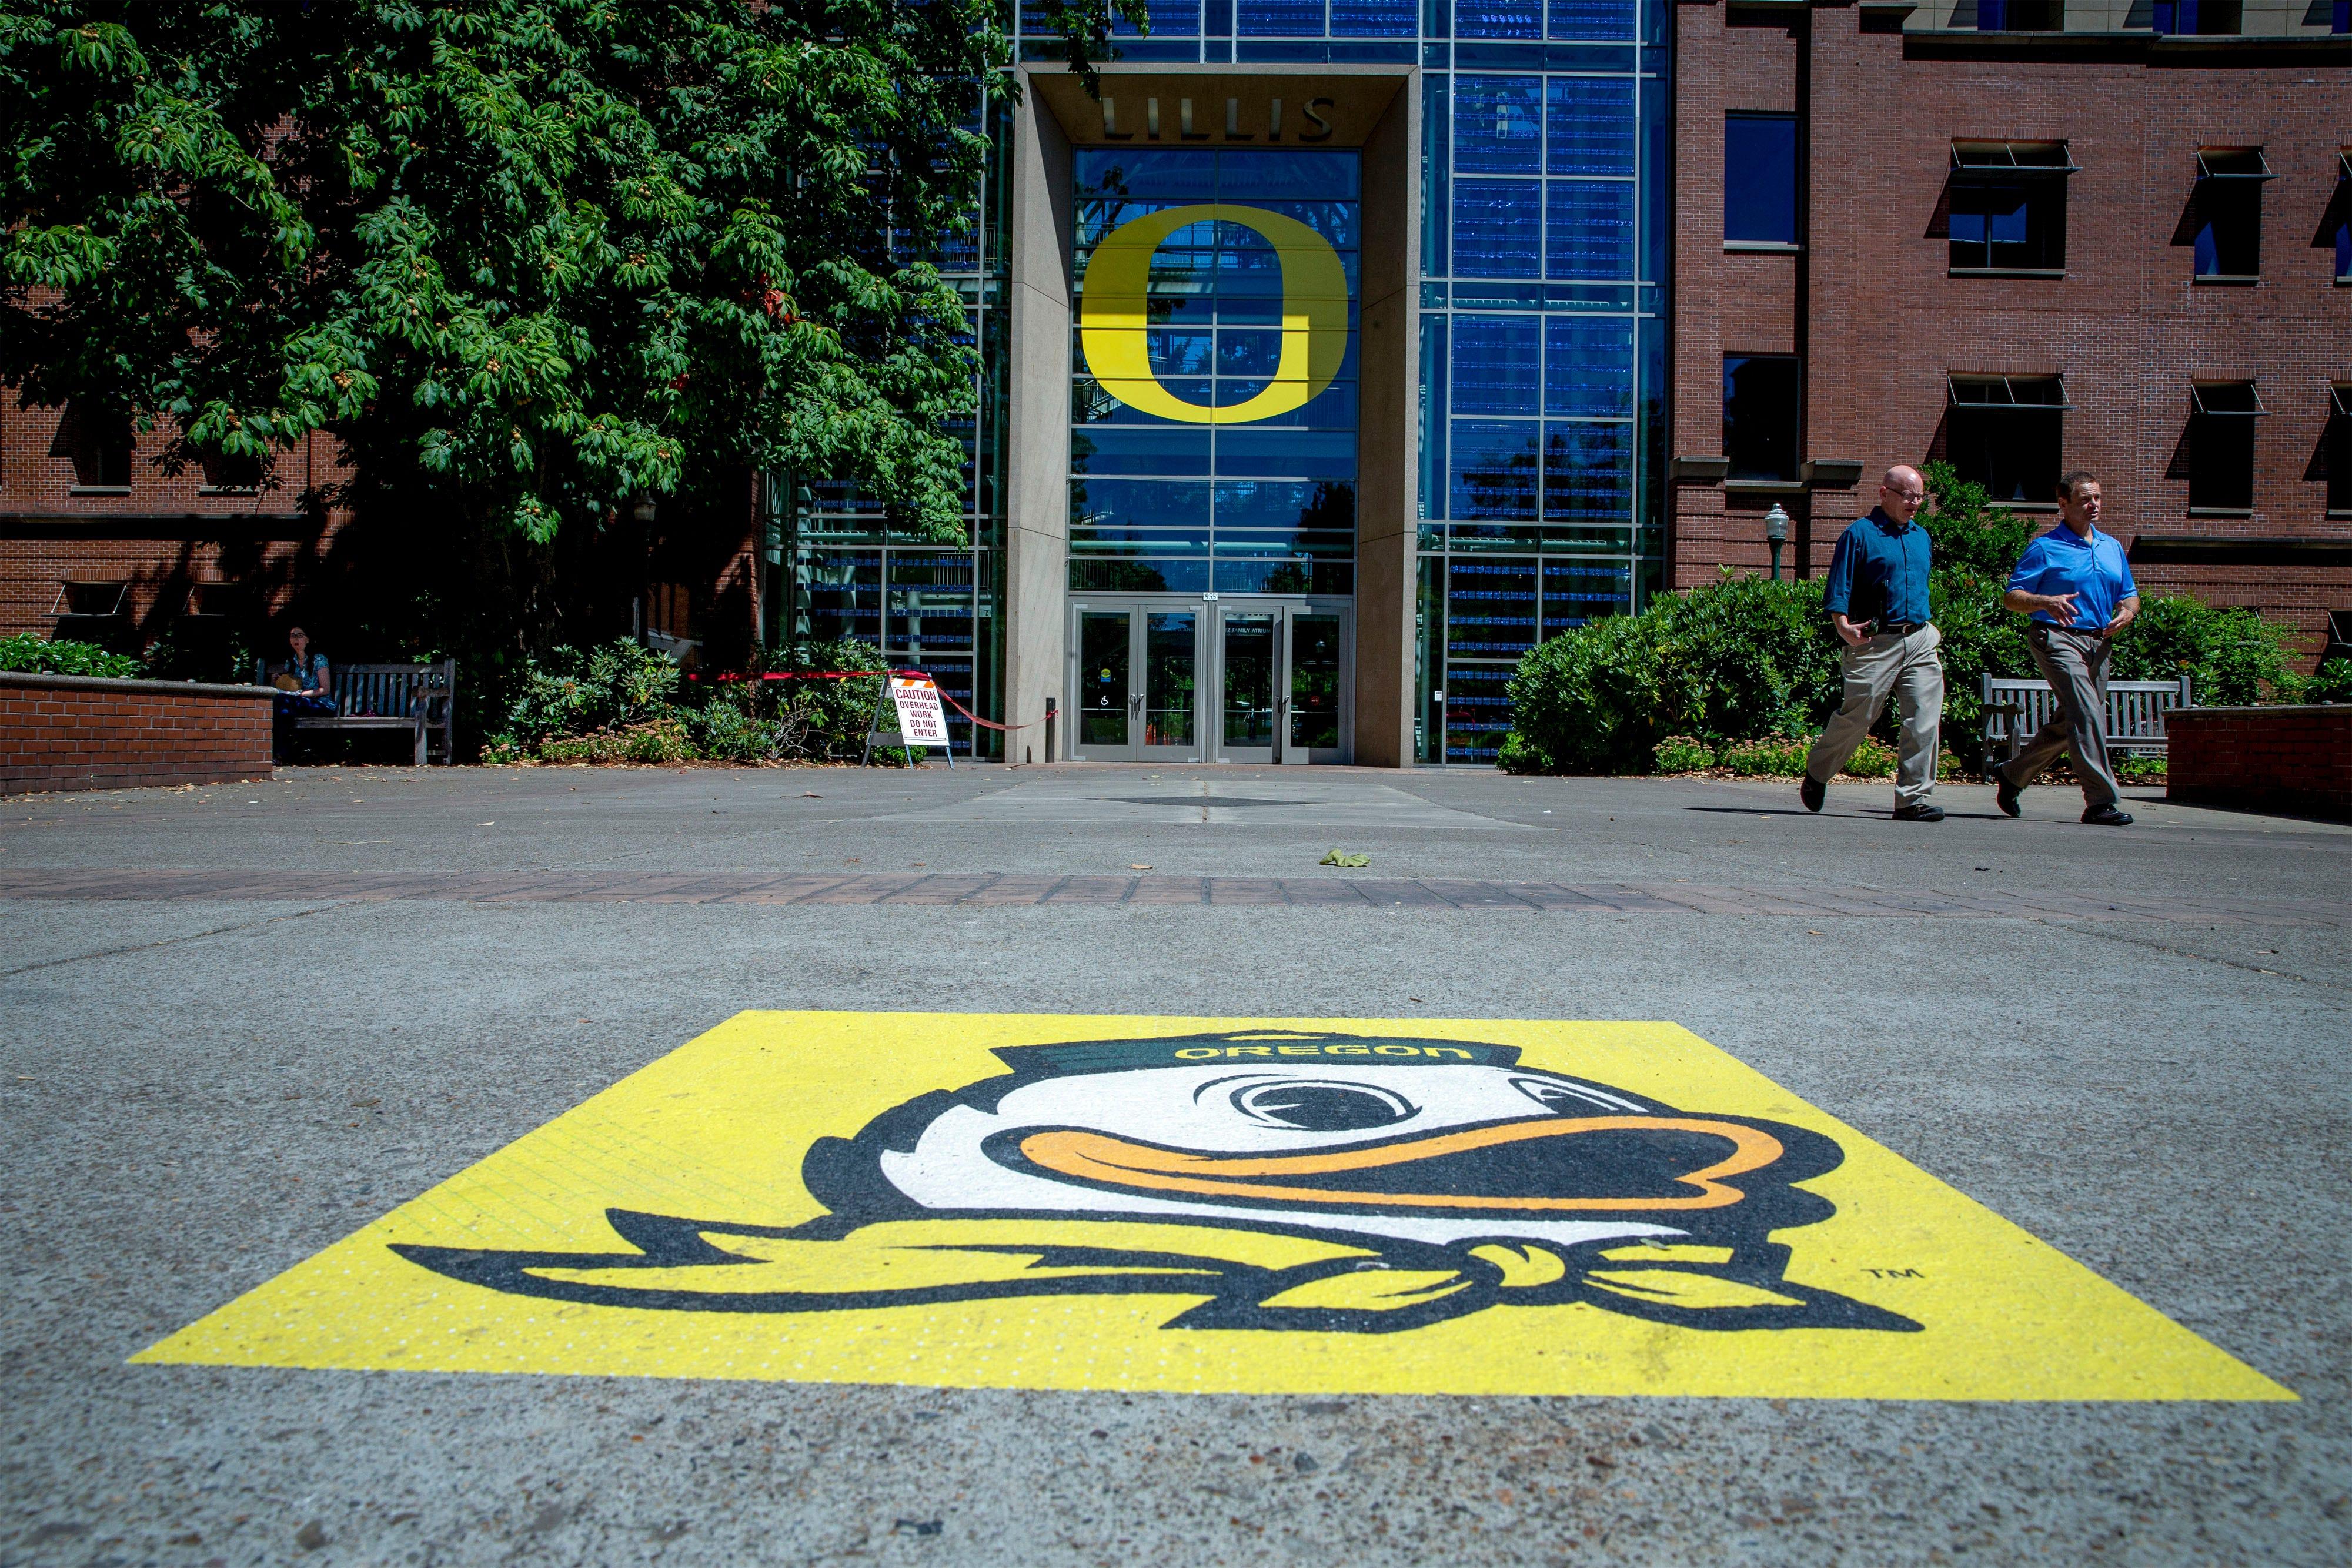 The University of Oregon